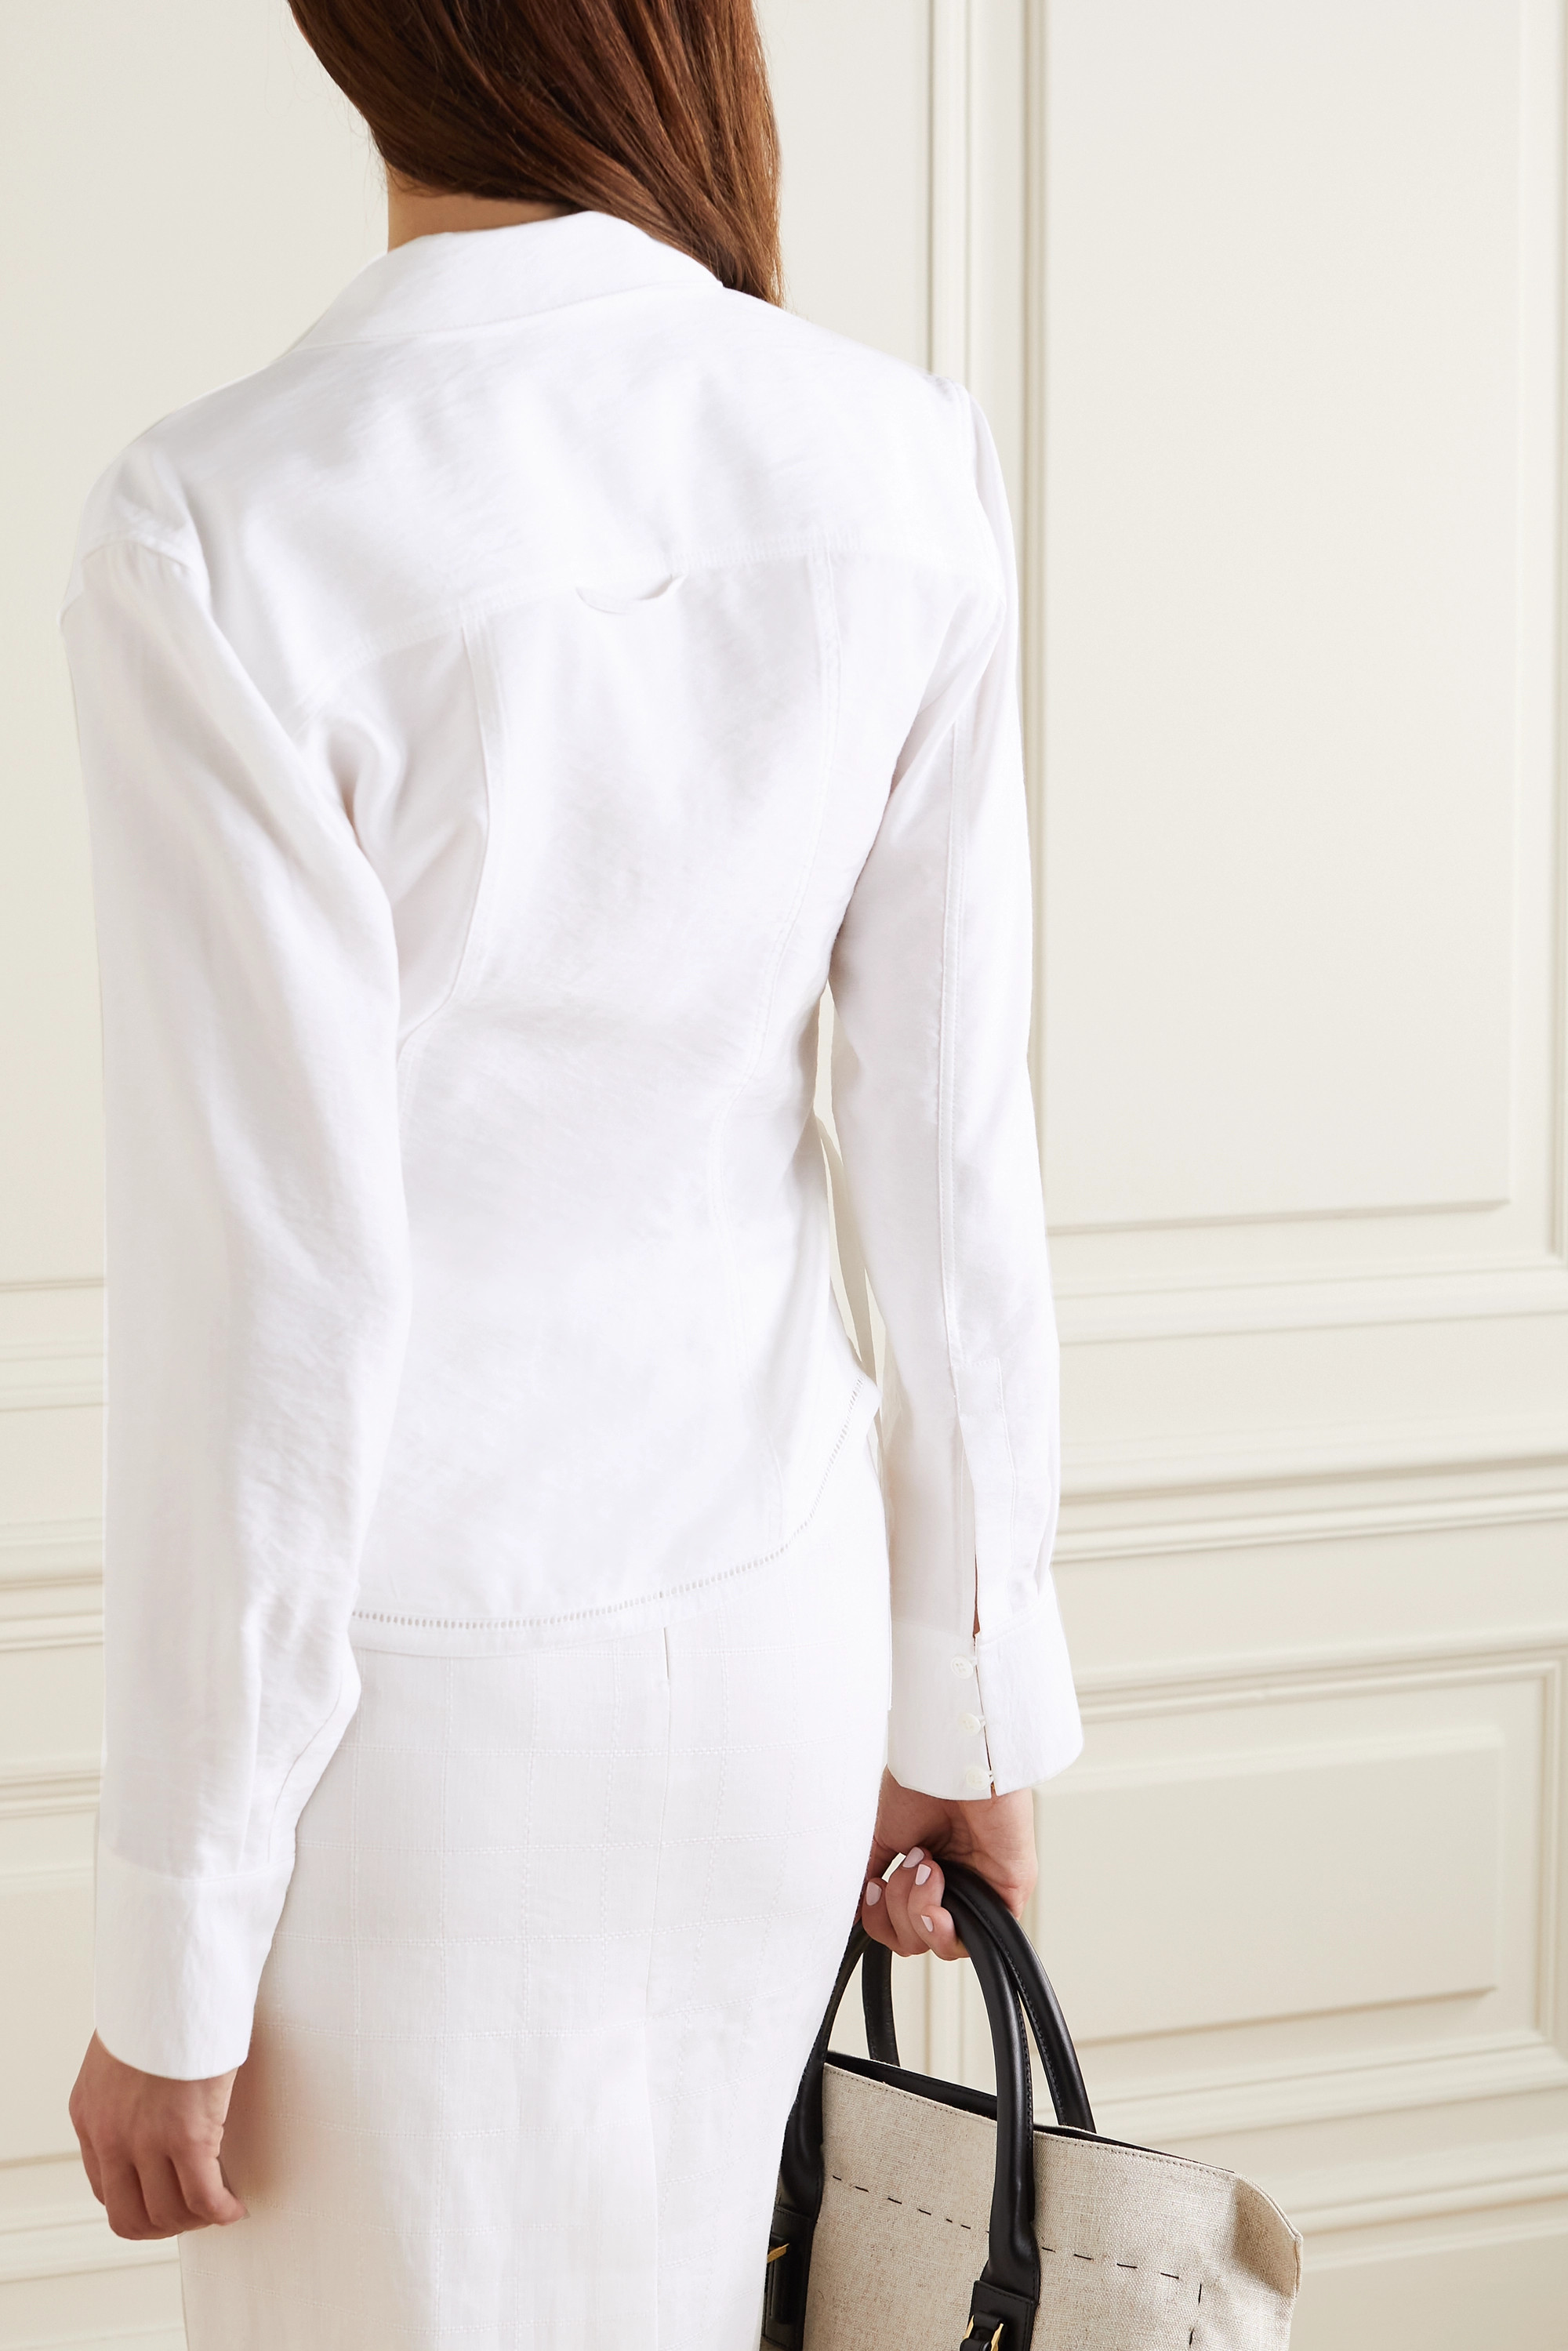 Jacquemus Nappe tie-detailed cutout woven shirt